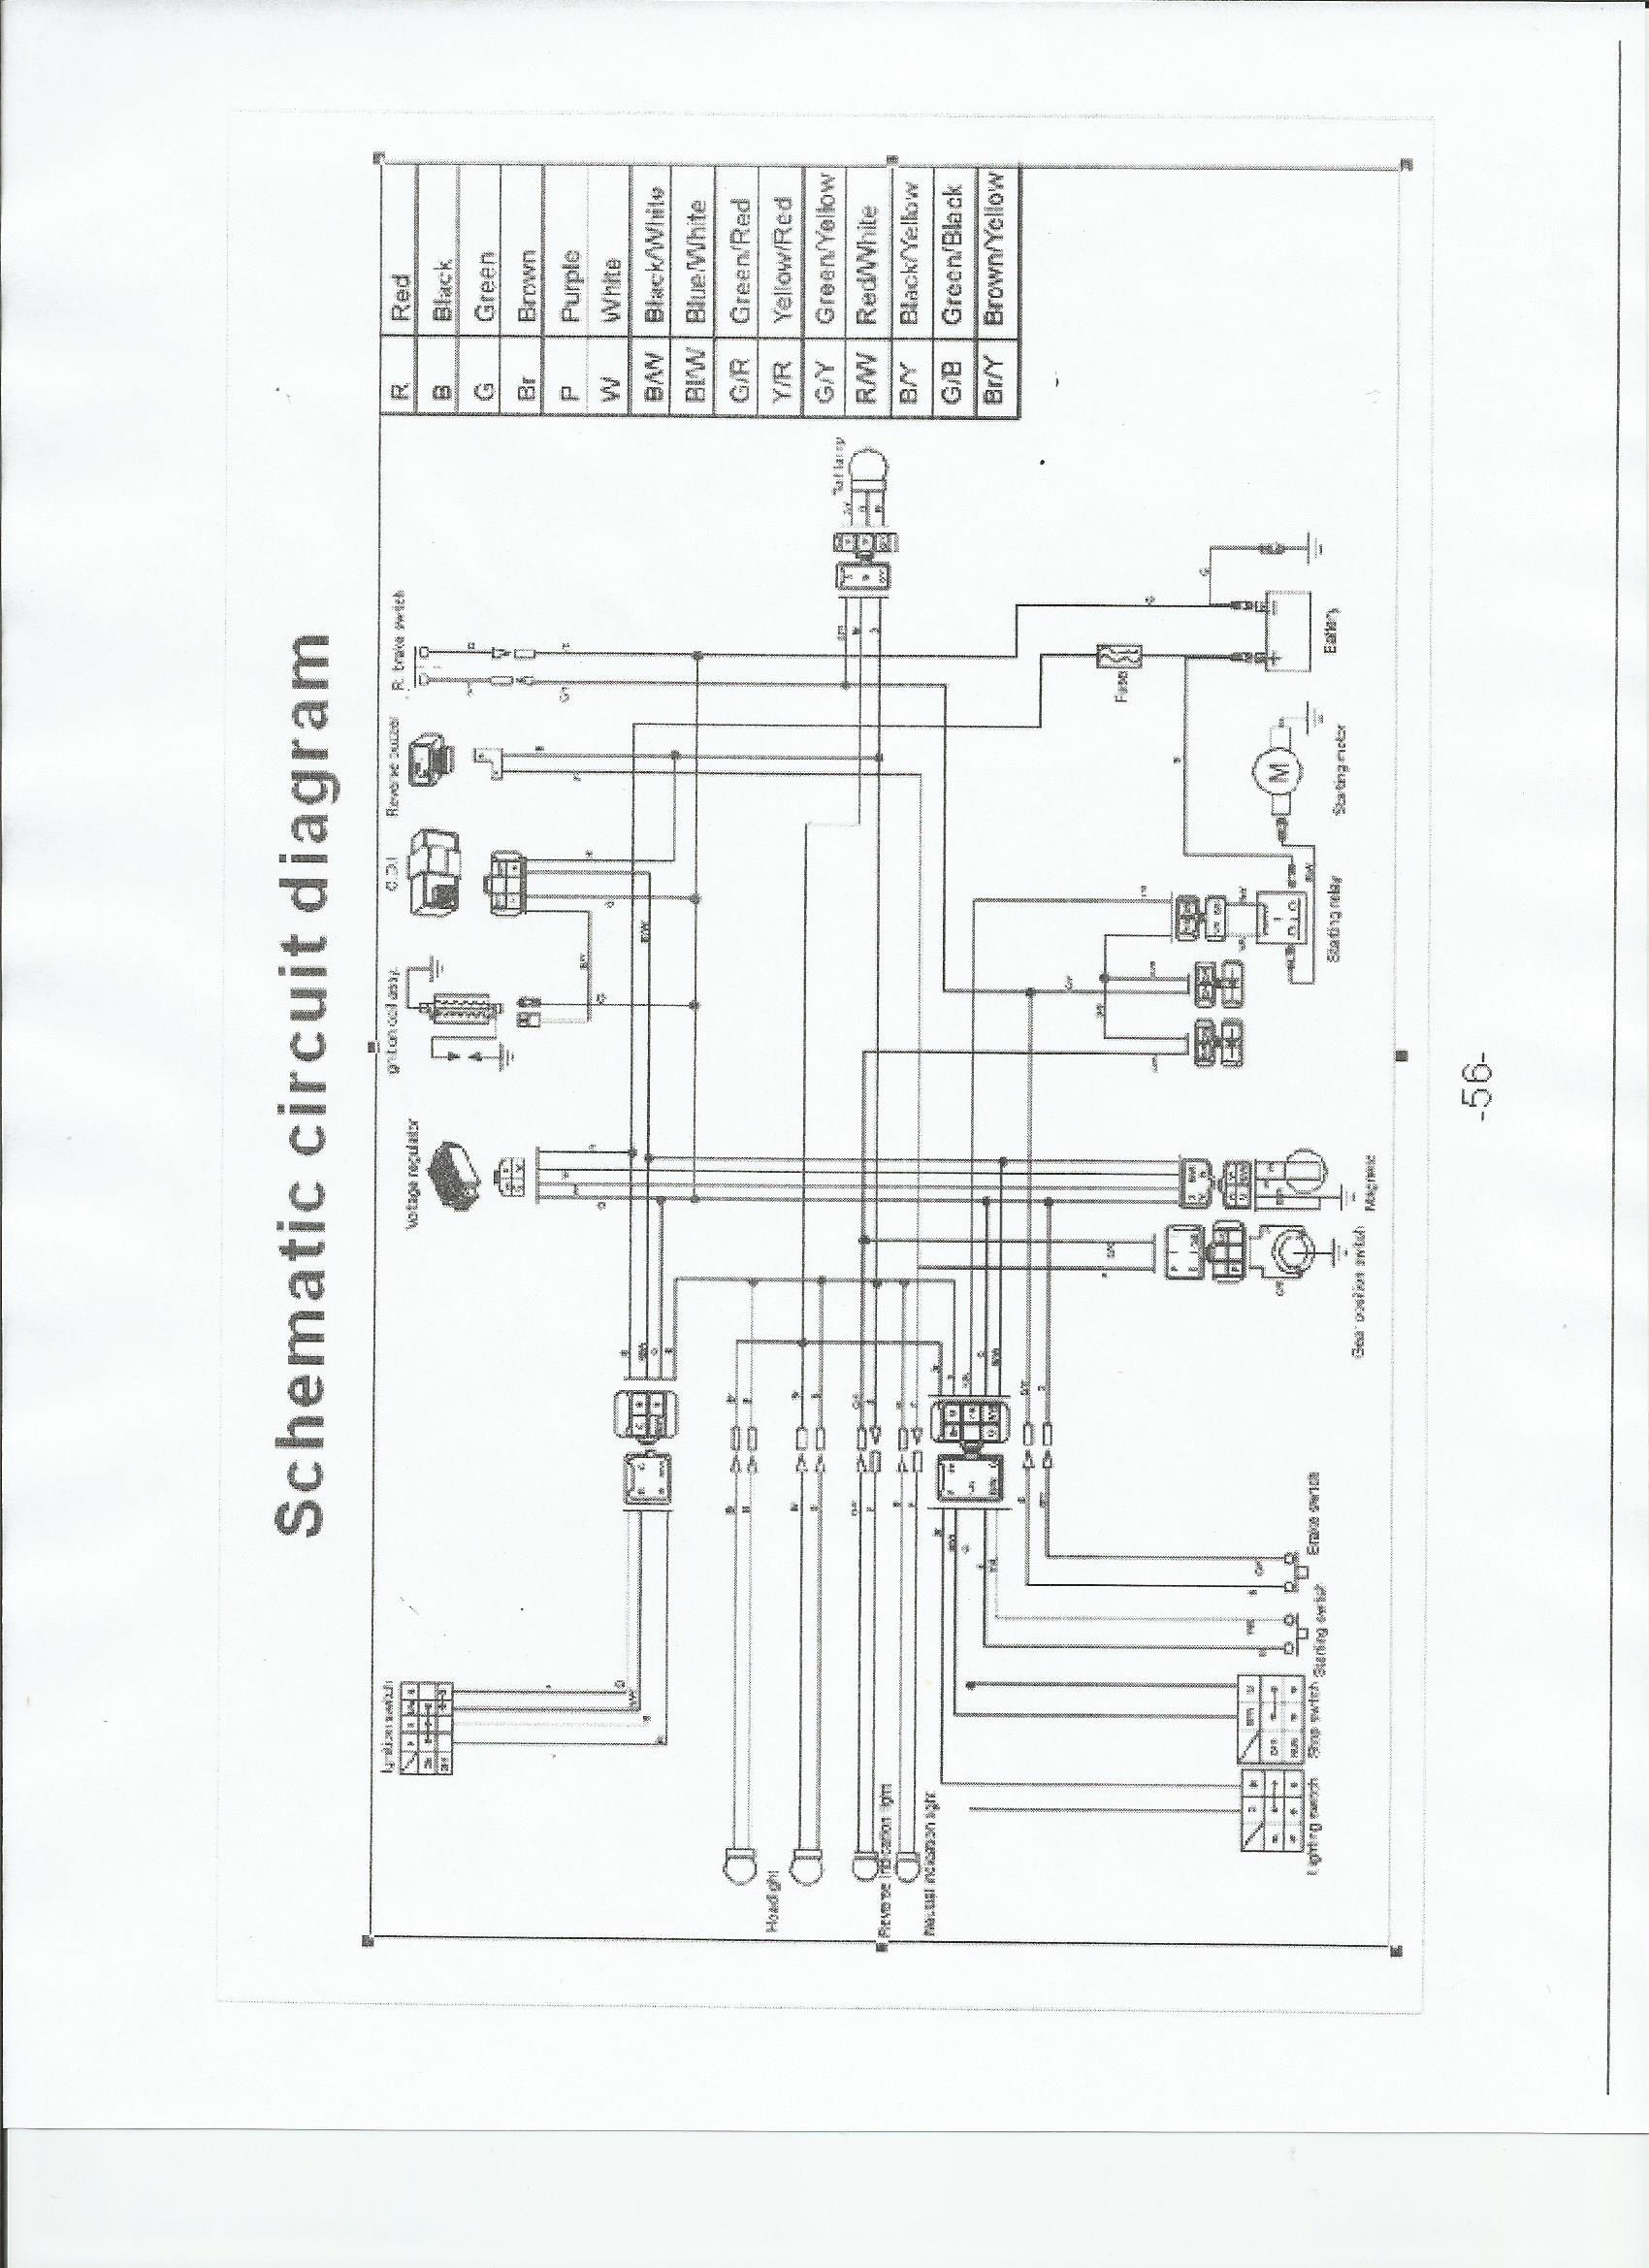 tao tao 50cc wiring diagrams